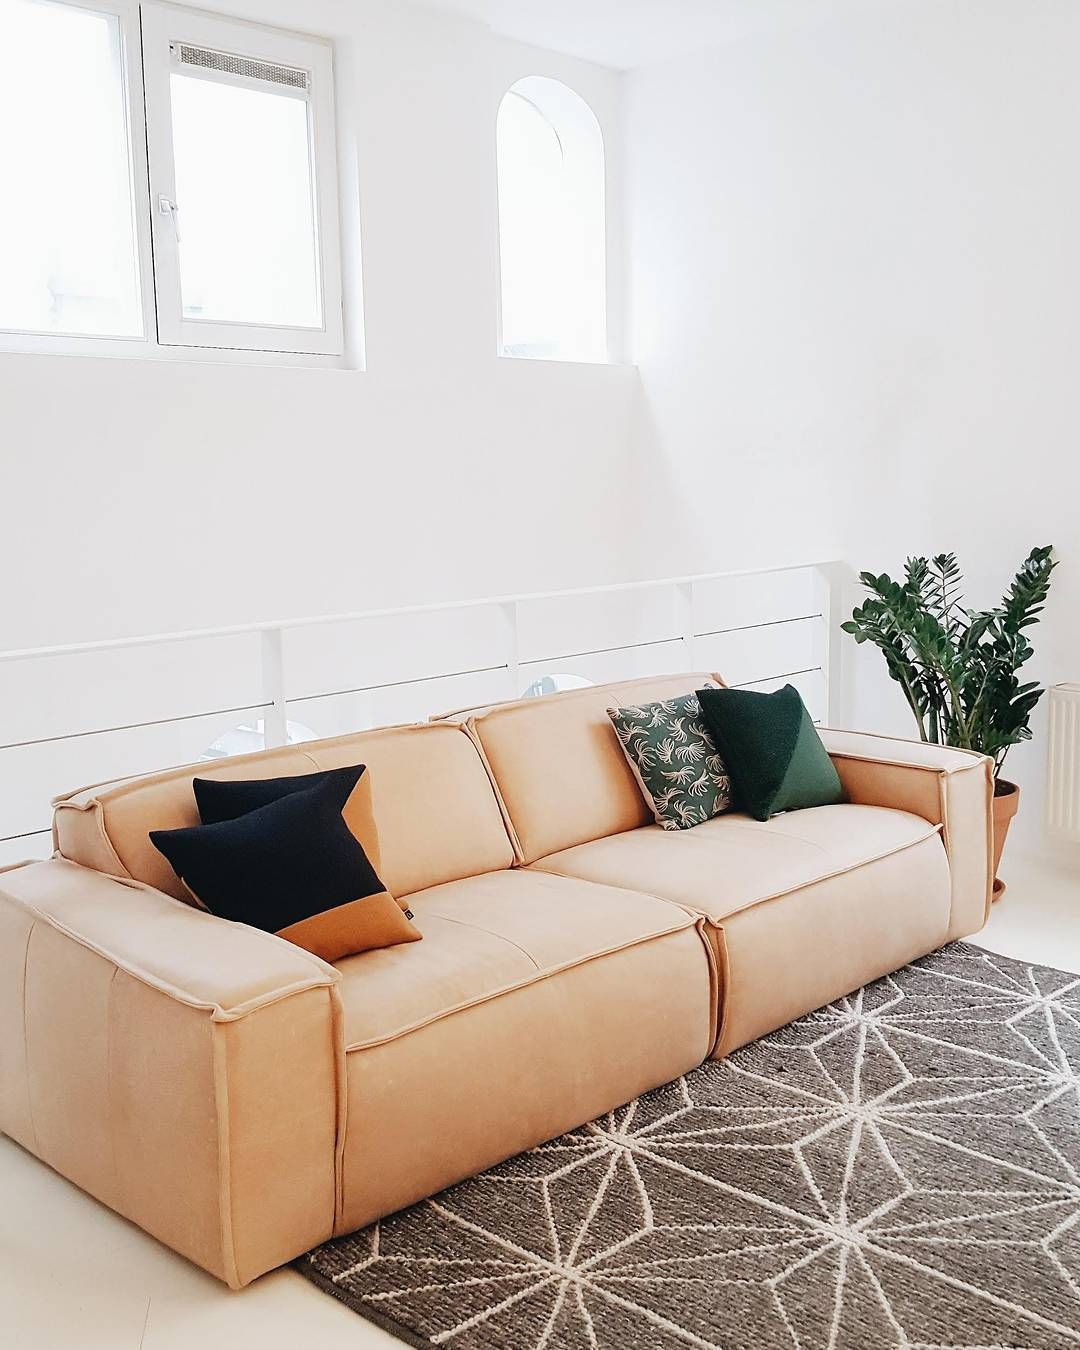 321 Vind Ik Leuks 14 Reacties Festamsterdam Op Instagram This Pretty Leather Edge Sofa Will Be Available On Next Week S Sample Sal Sofa Leather Sofa Room